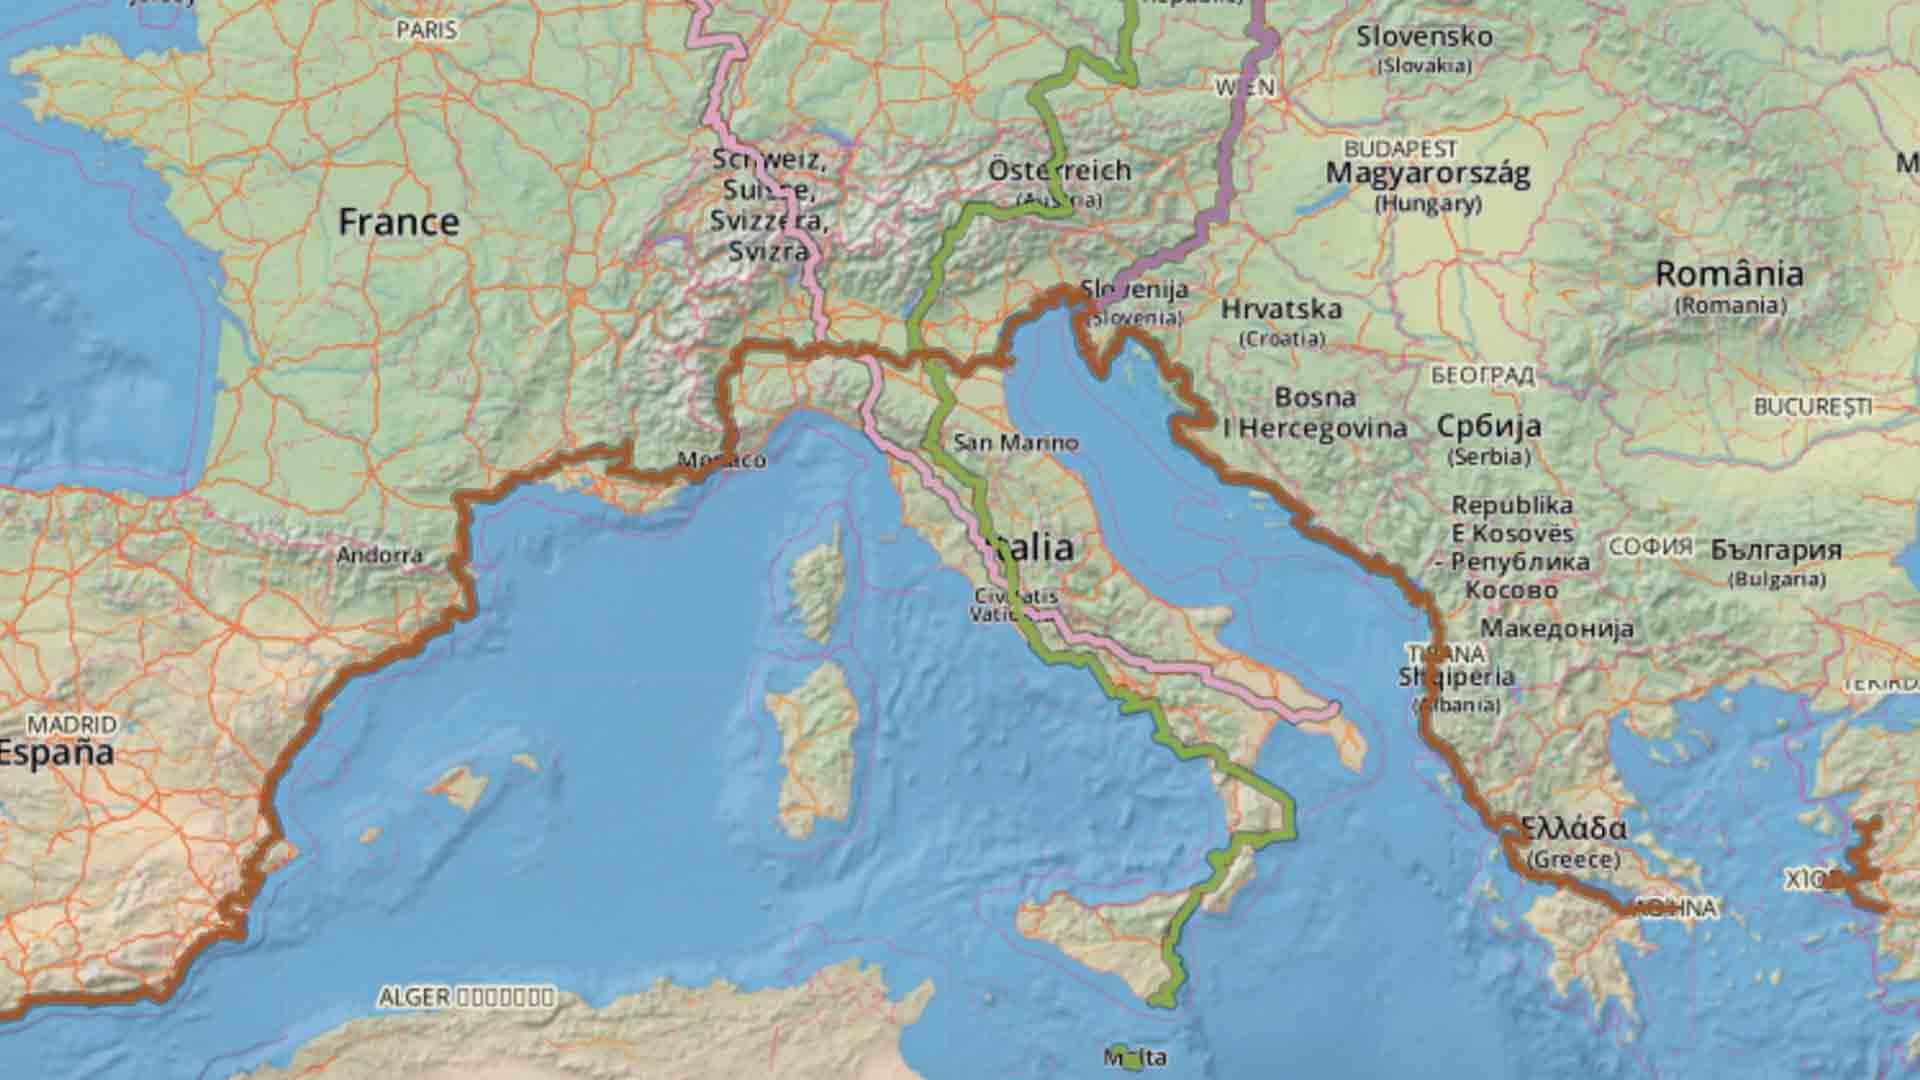 I percorsi Eurovelo in Italia